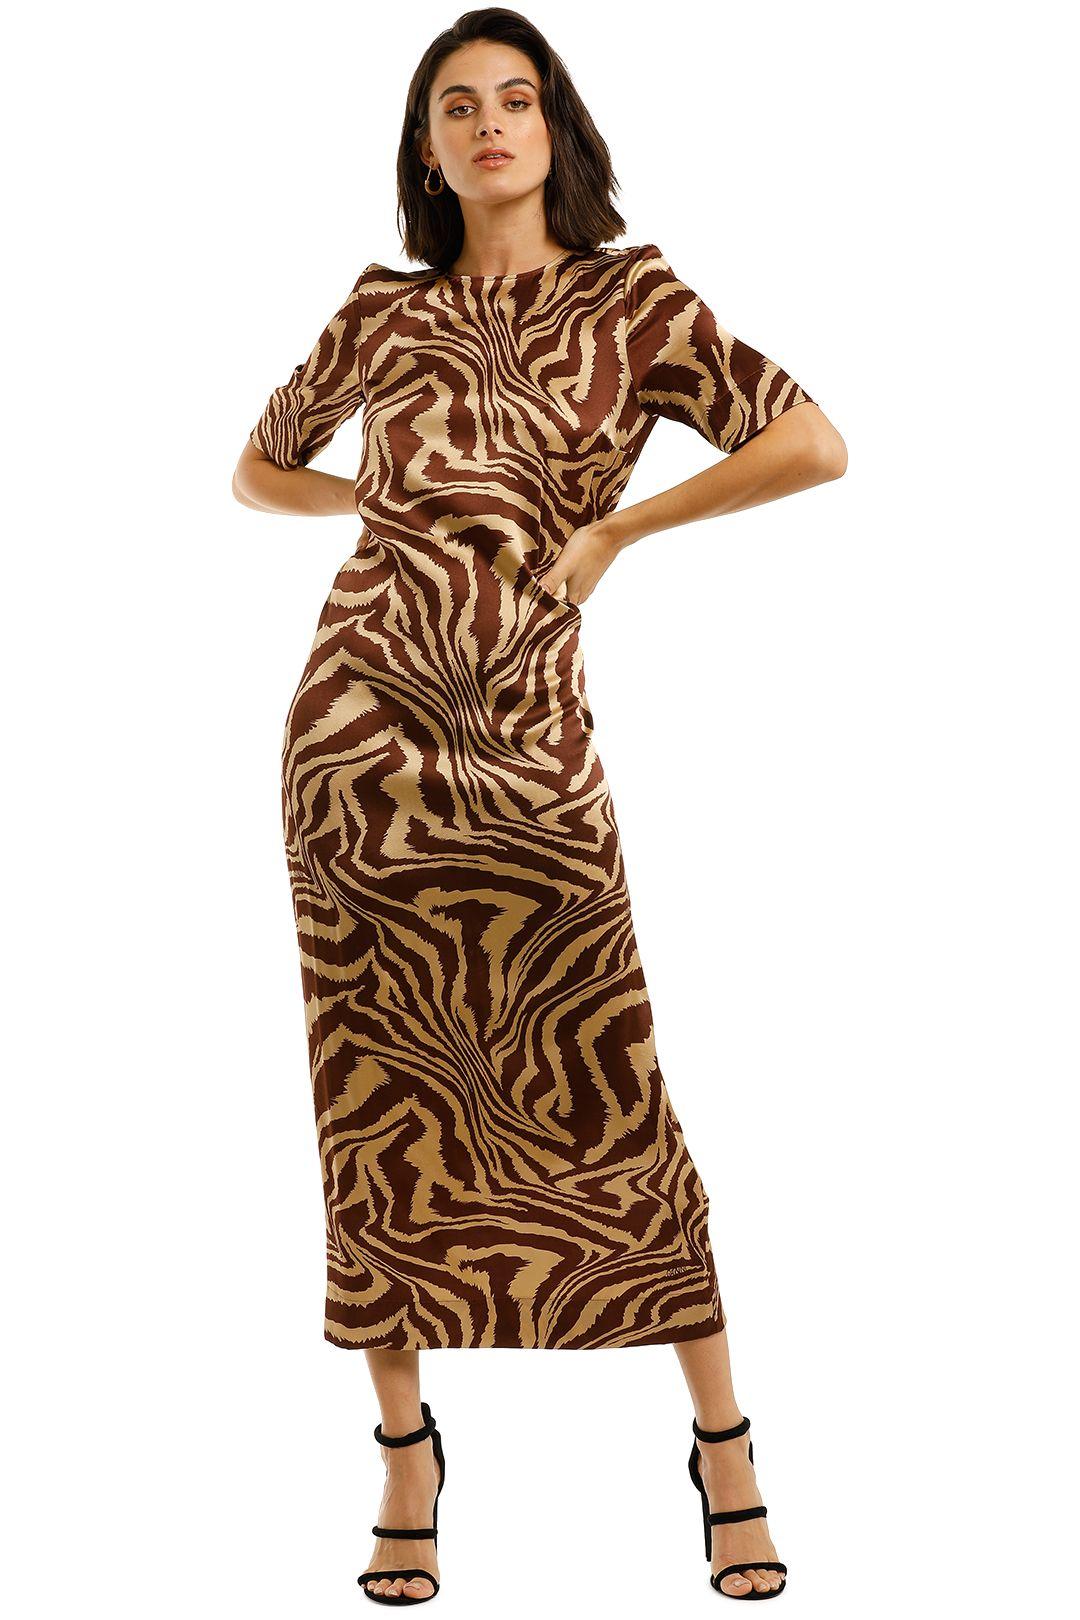 Ganni-Silk-Printed-Long-Dress-Tannin-Front